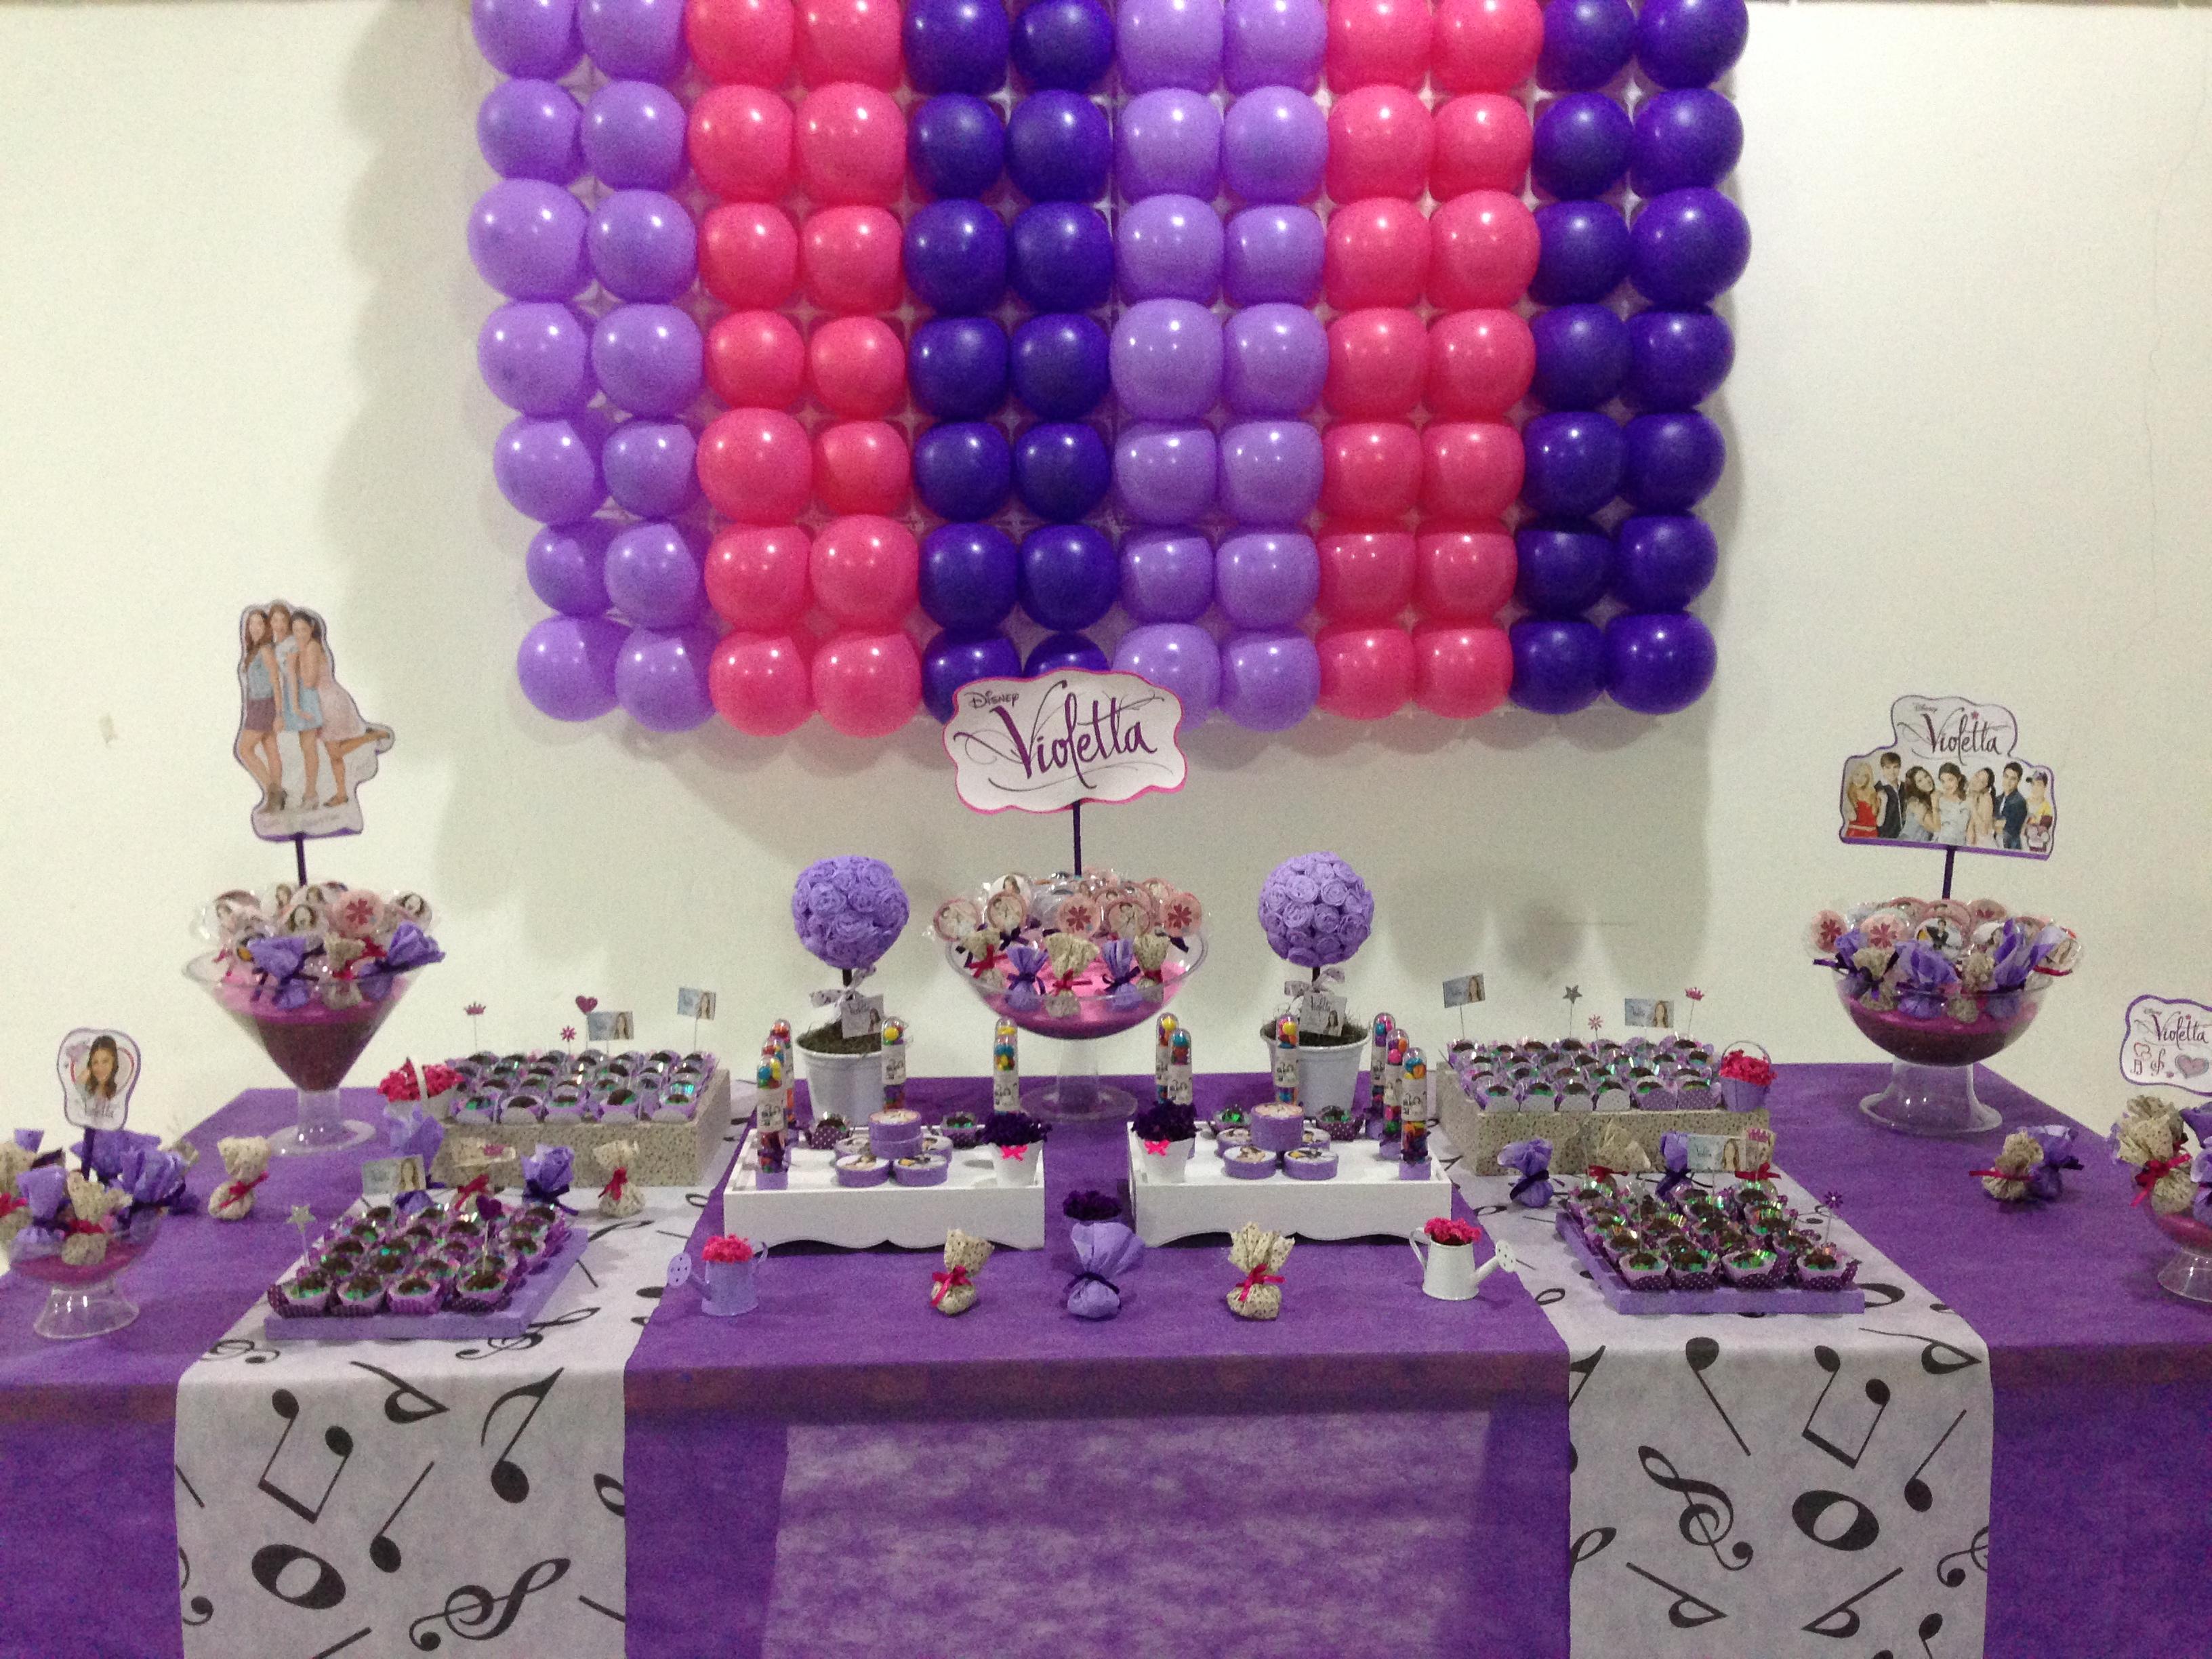 decoracao festa violeta: festa violetta disney festa violetta disney festa violetta disney